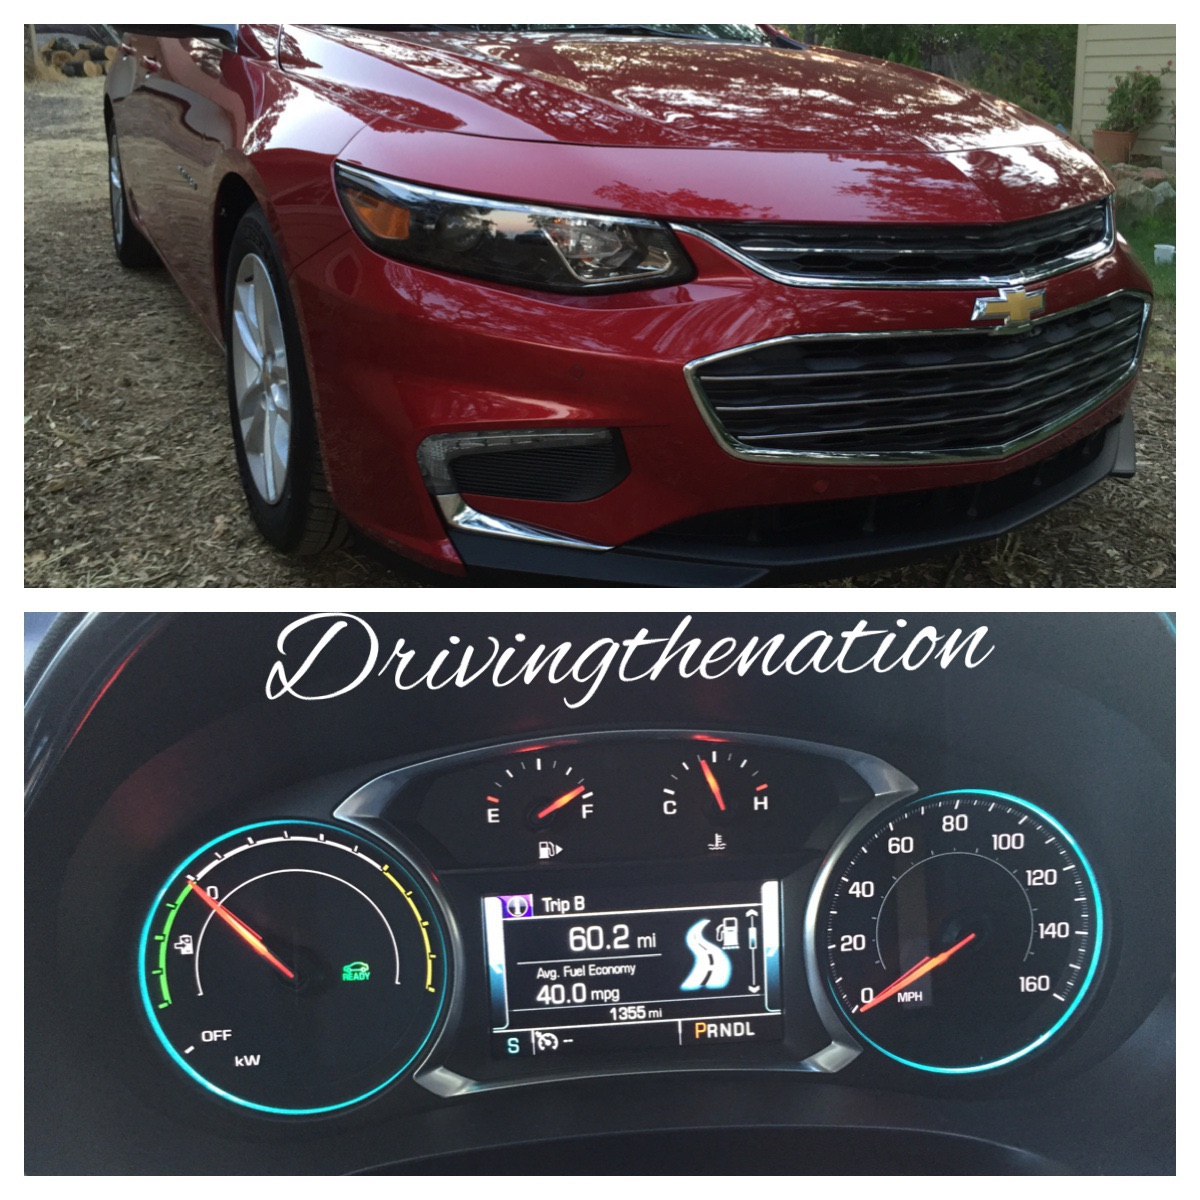 Chevy hybrid, VW buyback, WAZE, WAPO, carchat, washington post